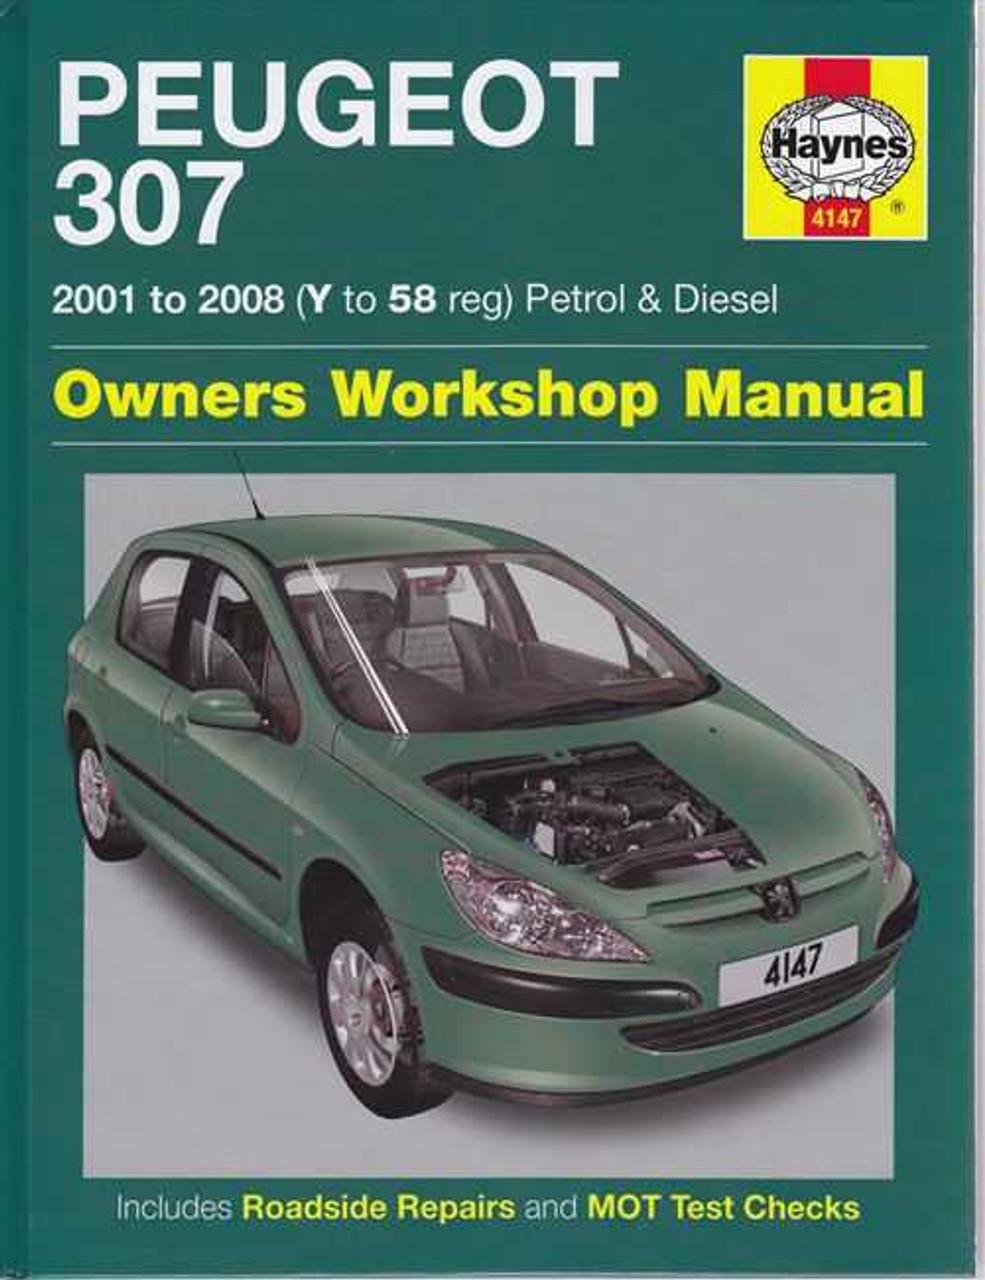 peugeot 307 petrol and diesel 2001 2008 workshop manual rh automotobookshop com au peugeot 504 pick up diesel manuel peugeot 3008 diesel manual